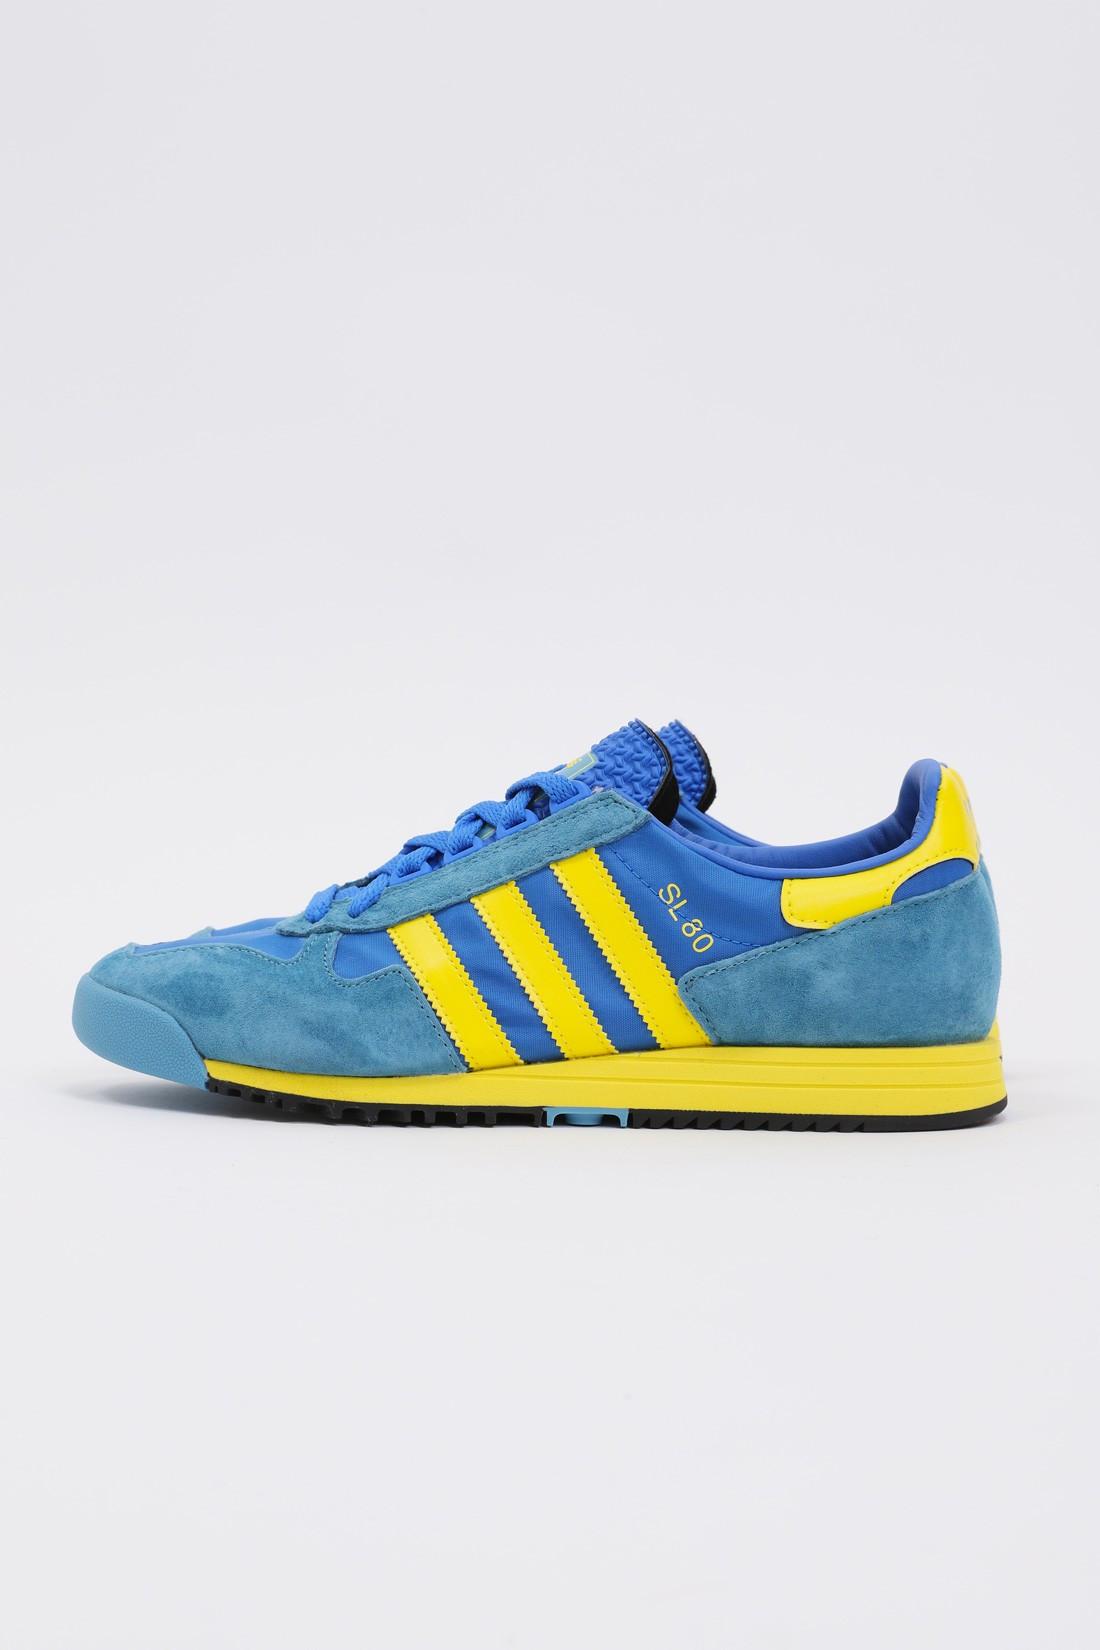 ADIDAS / Sl 80 fv4029 Blue / yellow